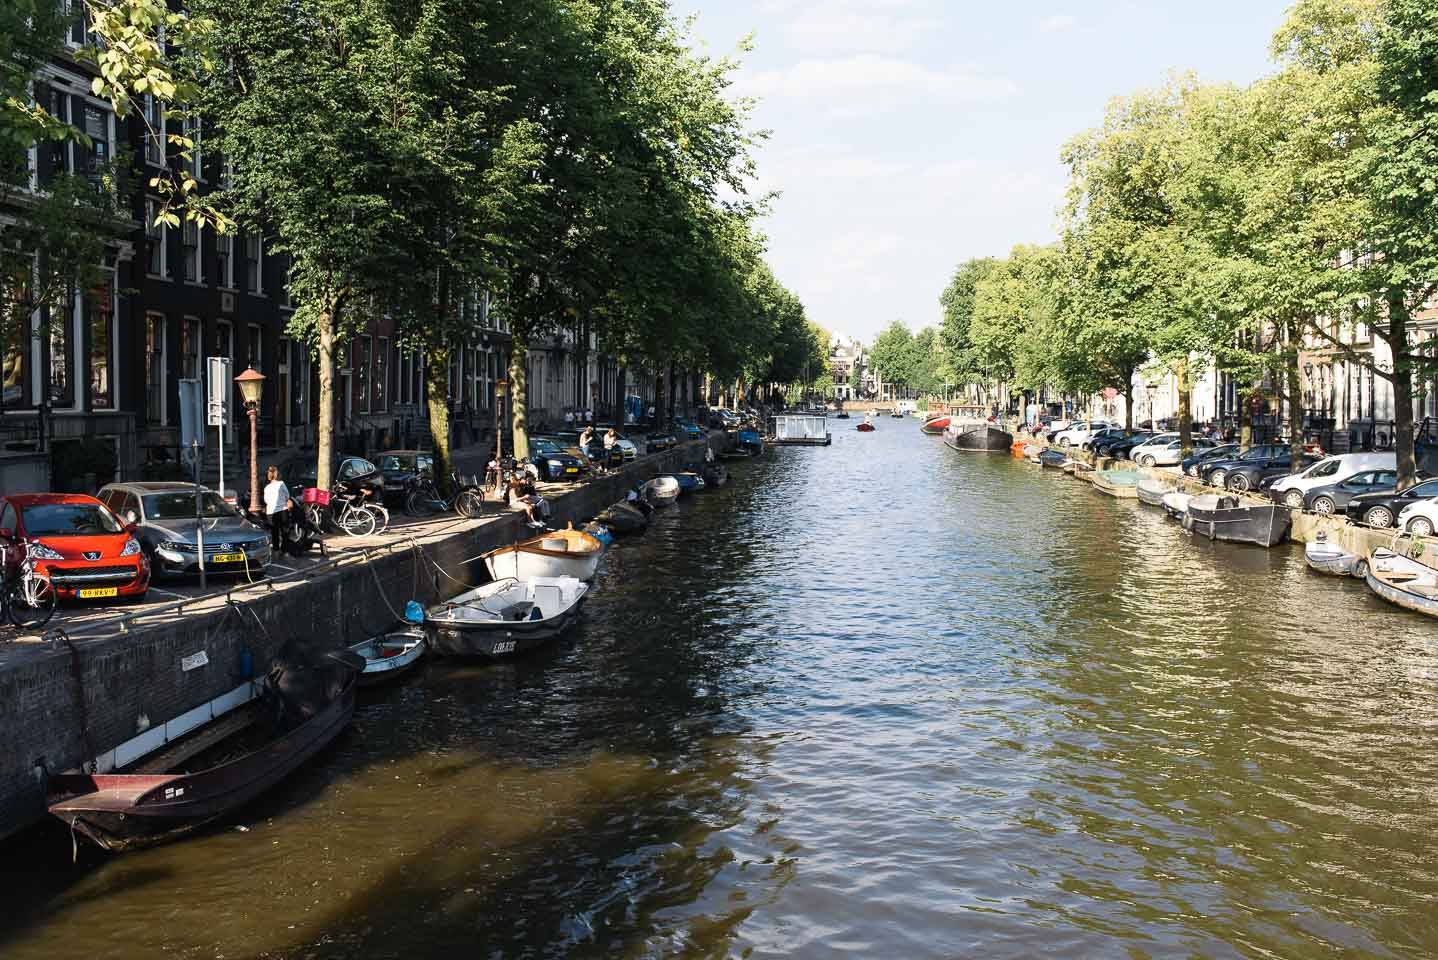 doubletree_amsterdam_kl-12